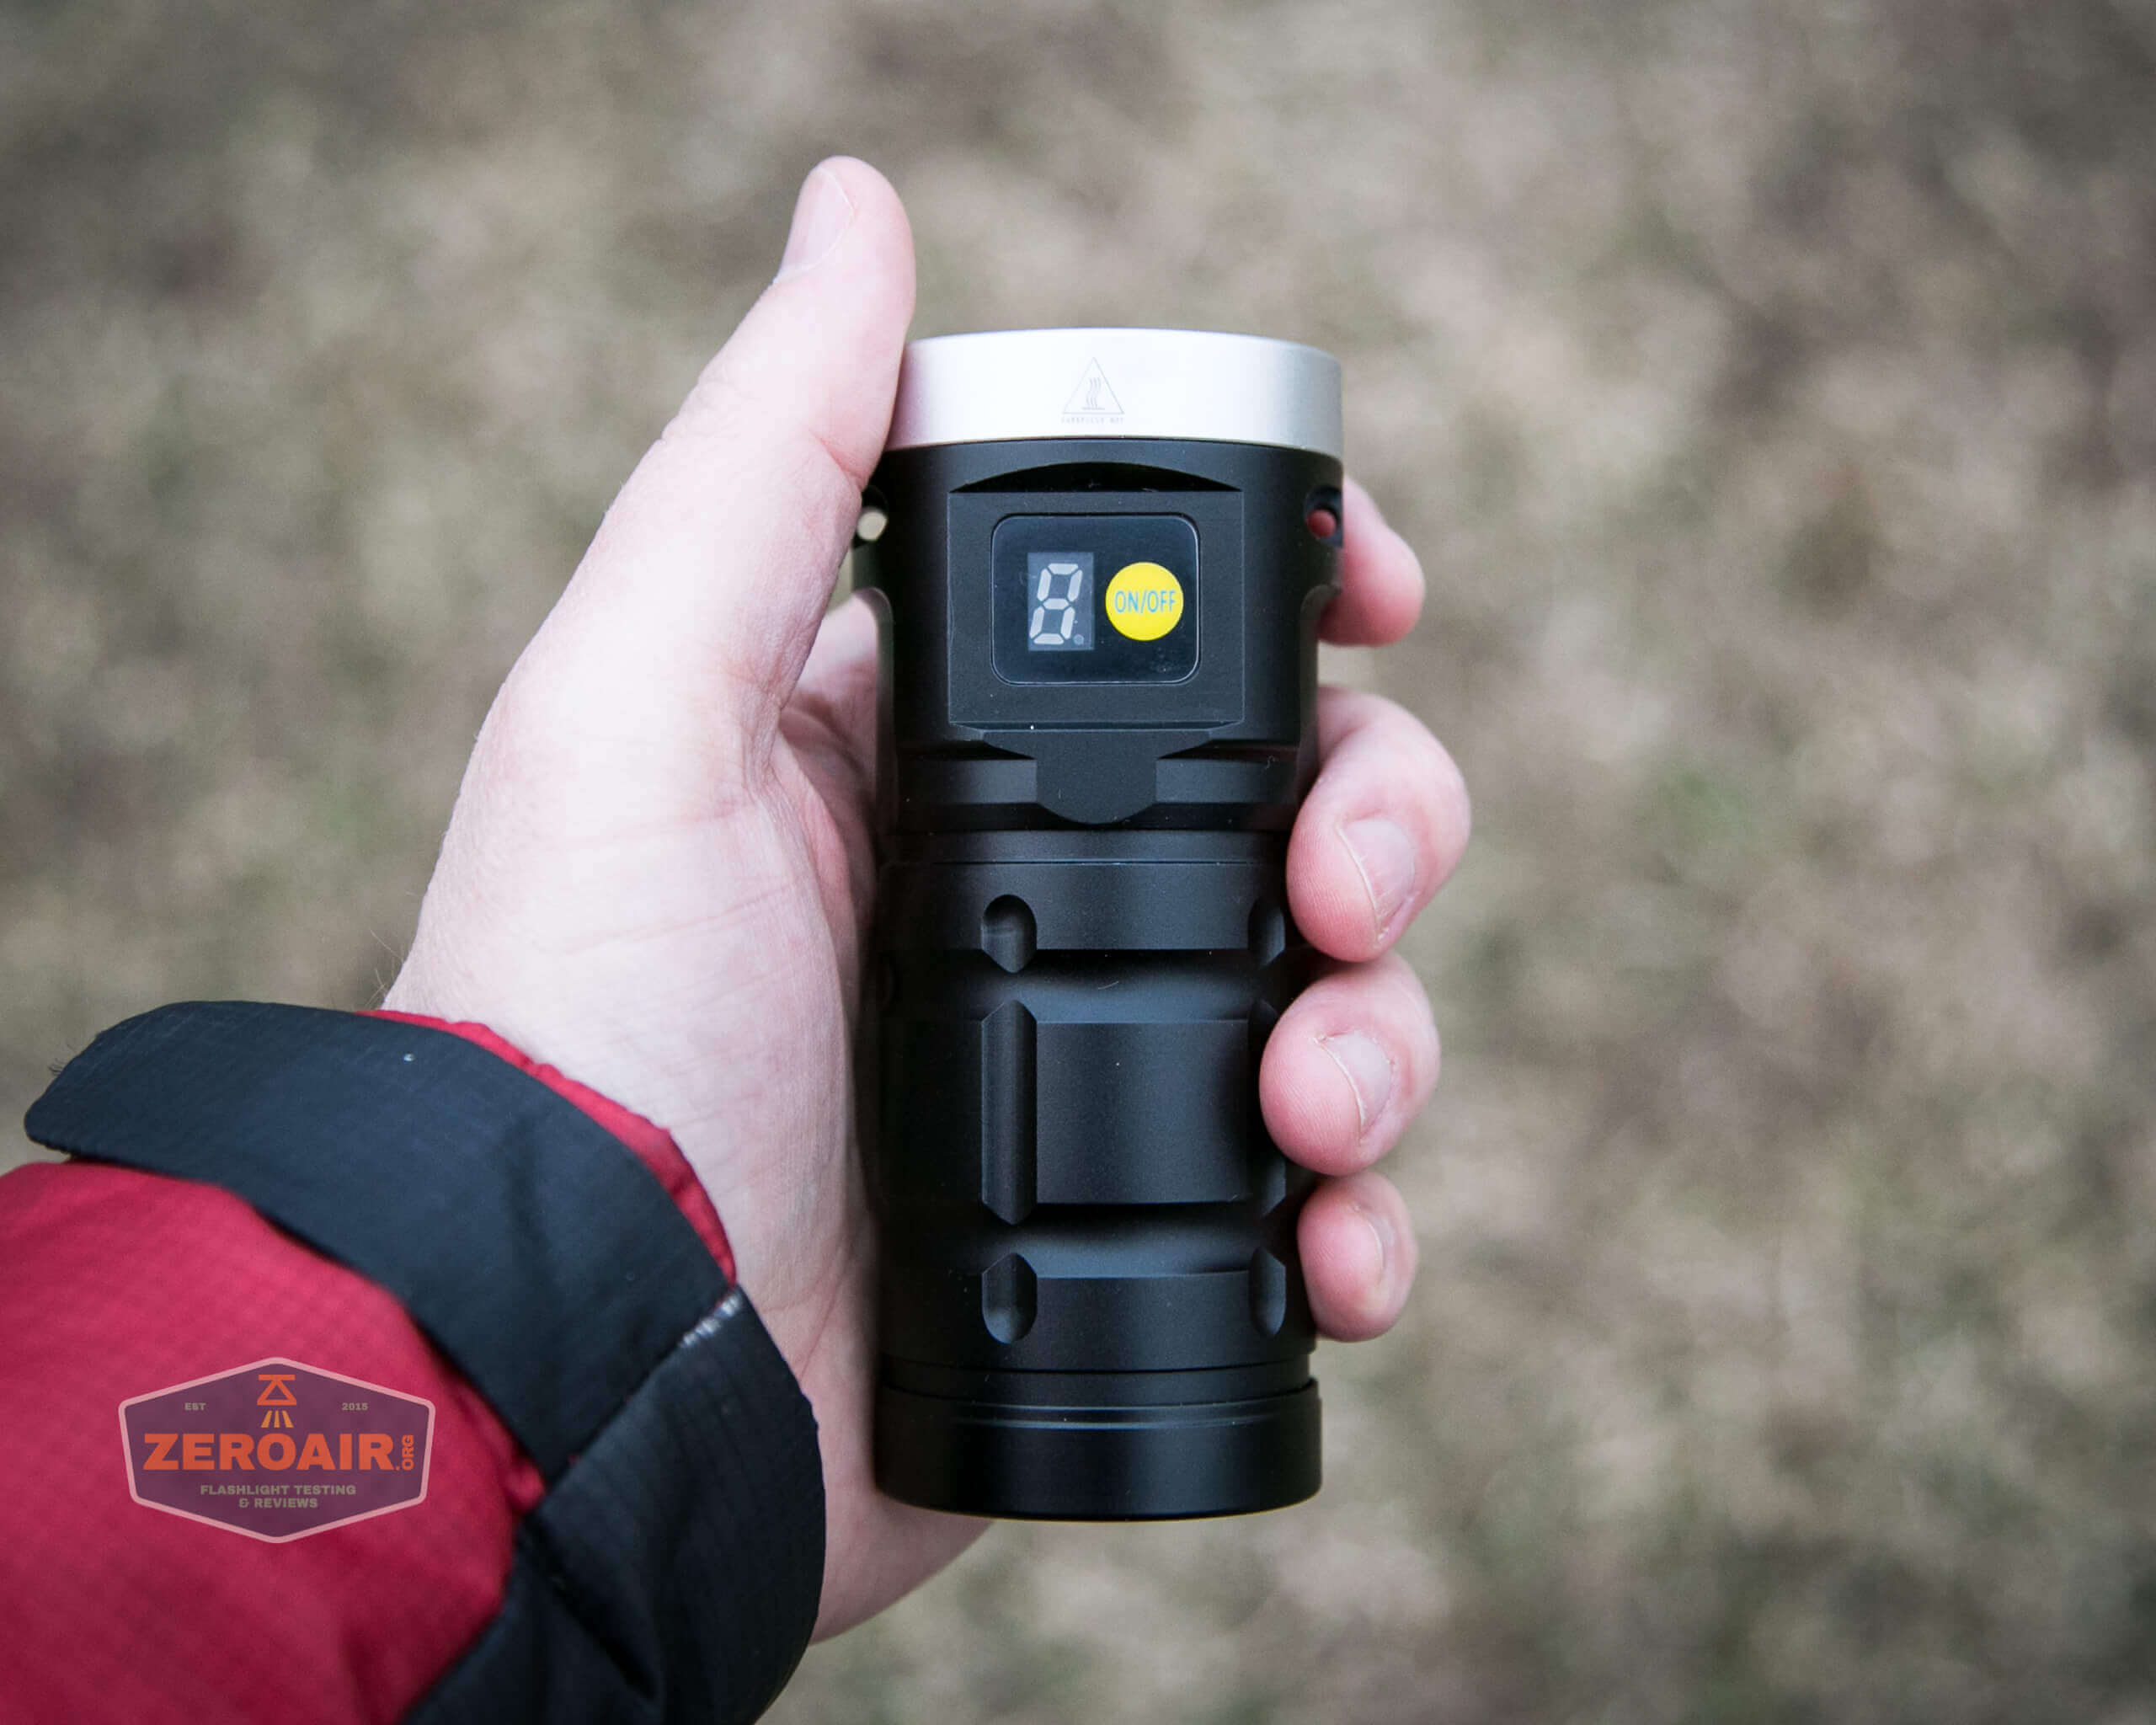 nitebeam x12uv flashlight in hand